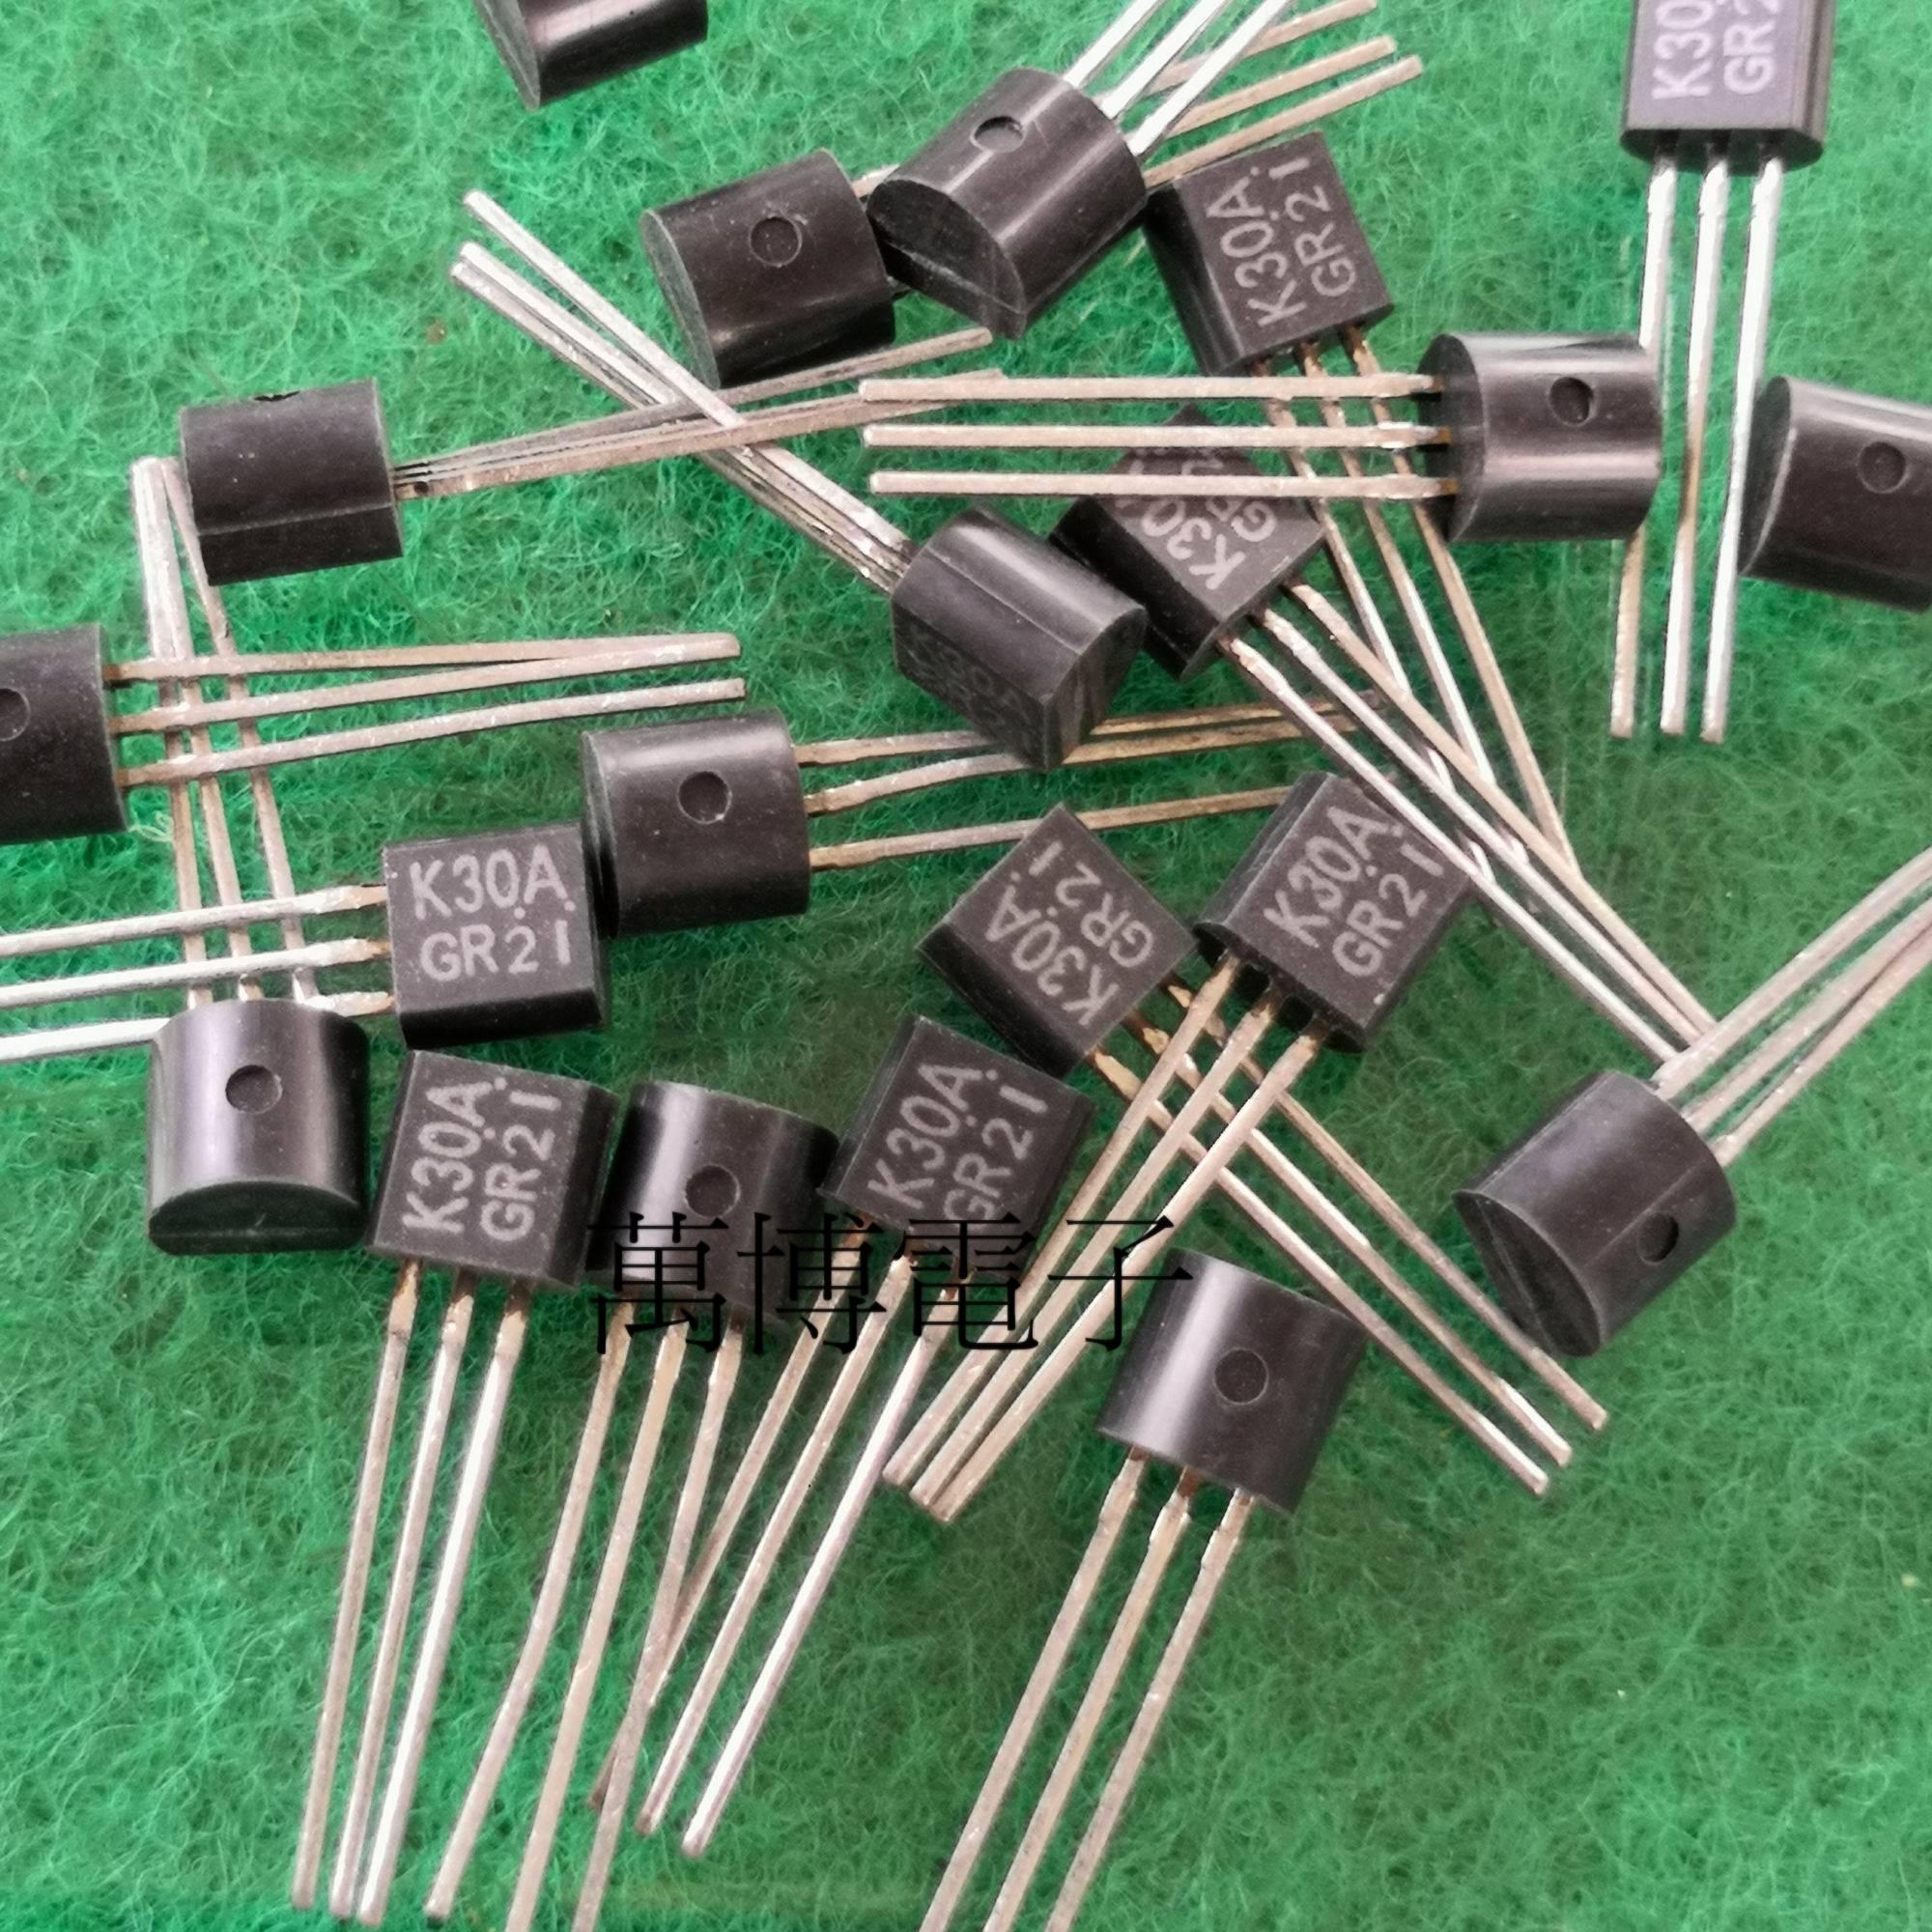 50pcs 2SK30A-GR 2SK30A K30A-GR K30A TOSHIBA Transistor TO-92